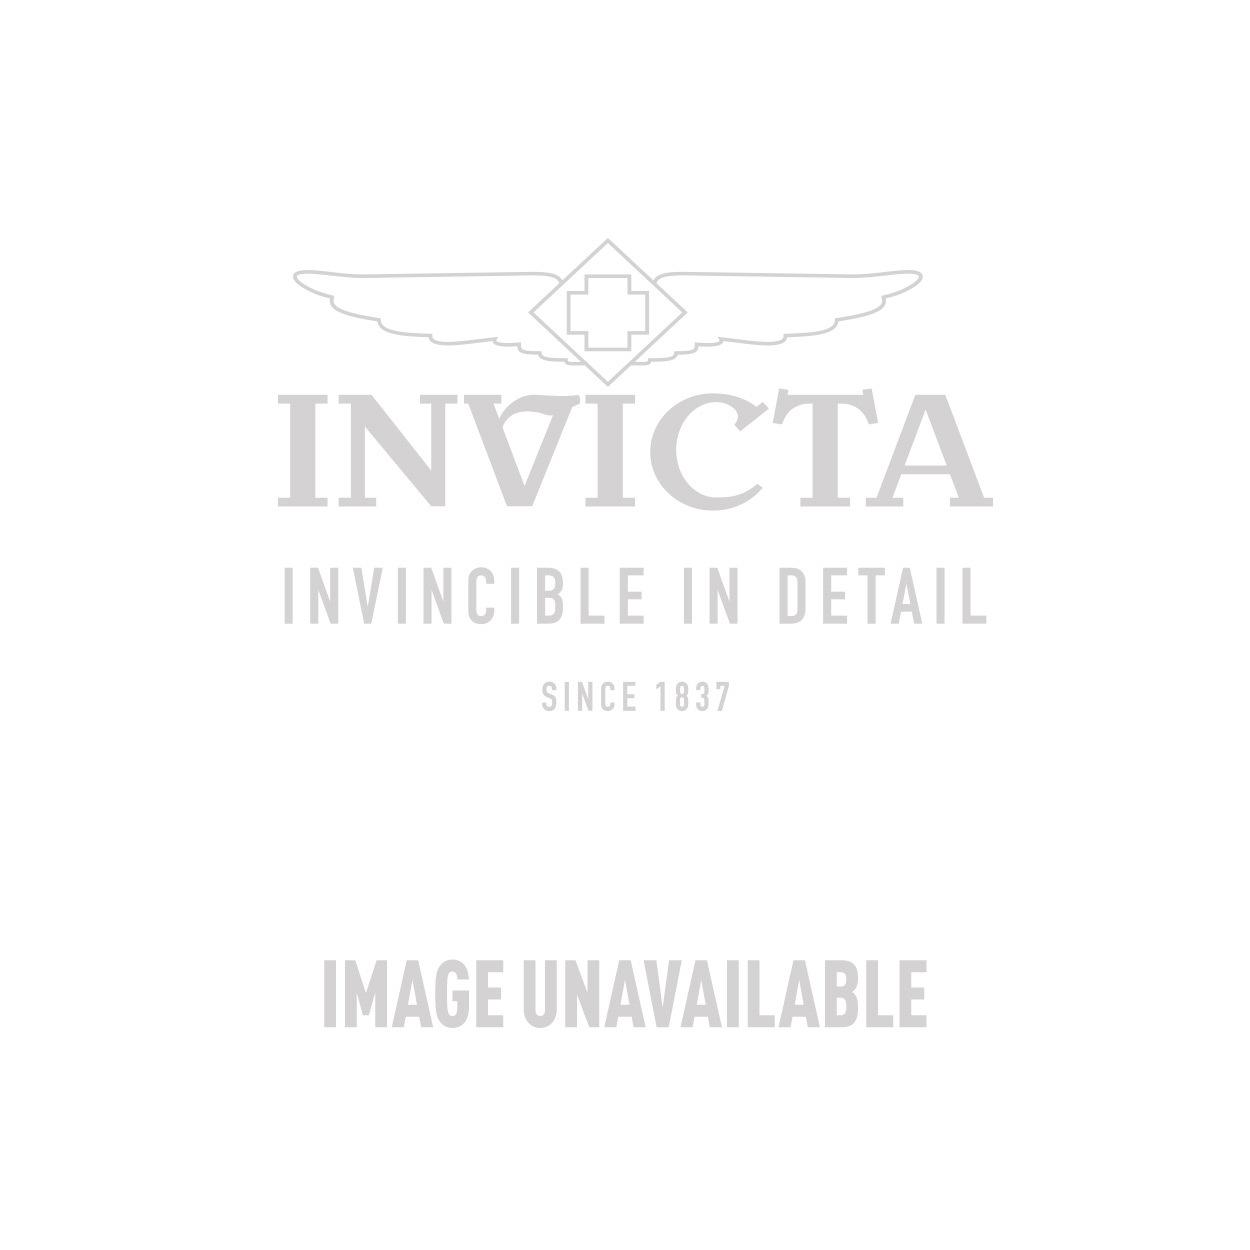 Invicta I-Force Swiss Movement Quartz Watch - Black case with Black tone Polyurethane band - Model 12966